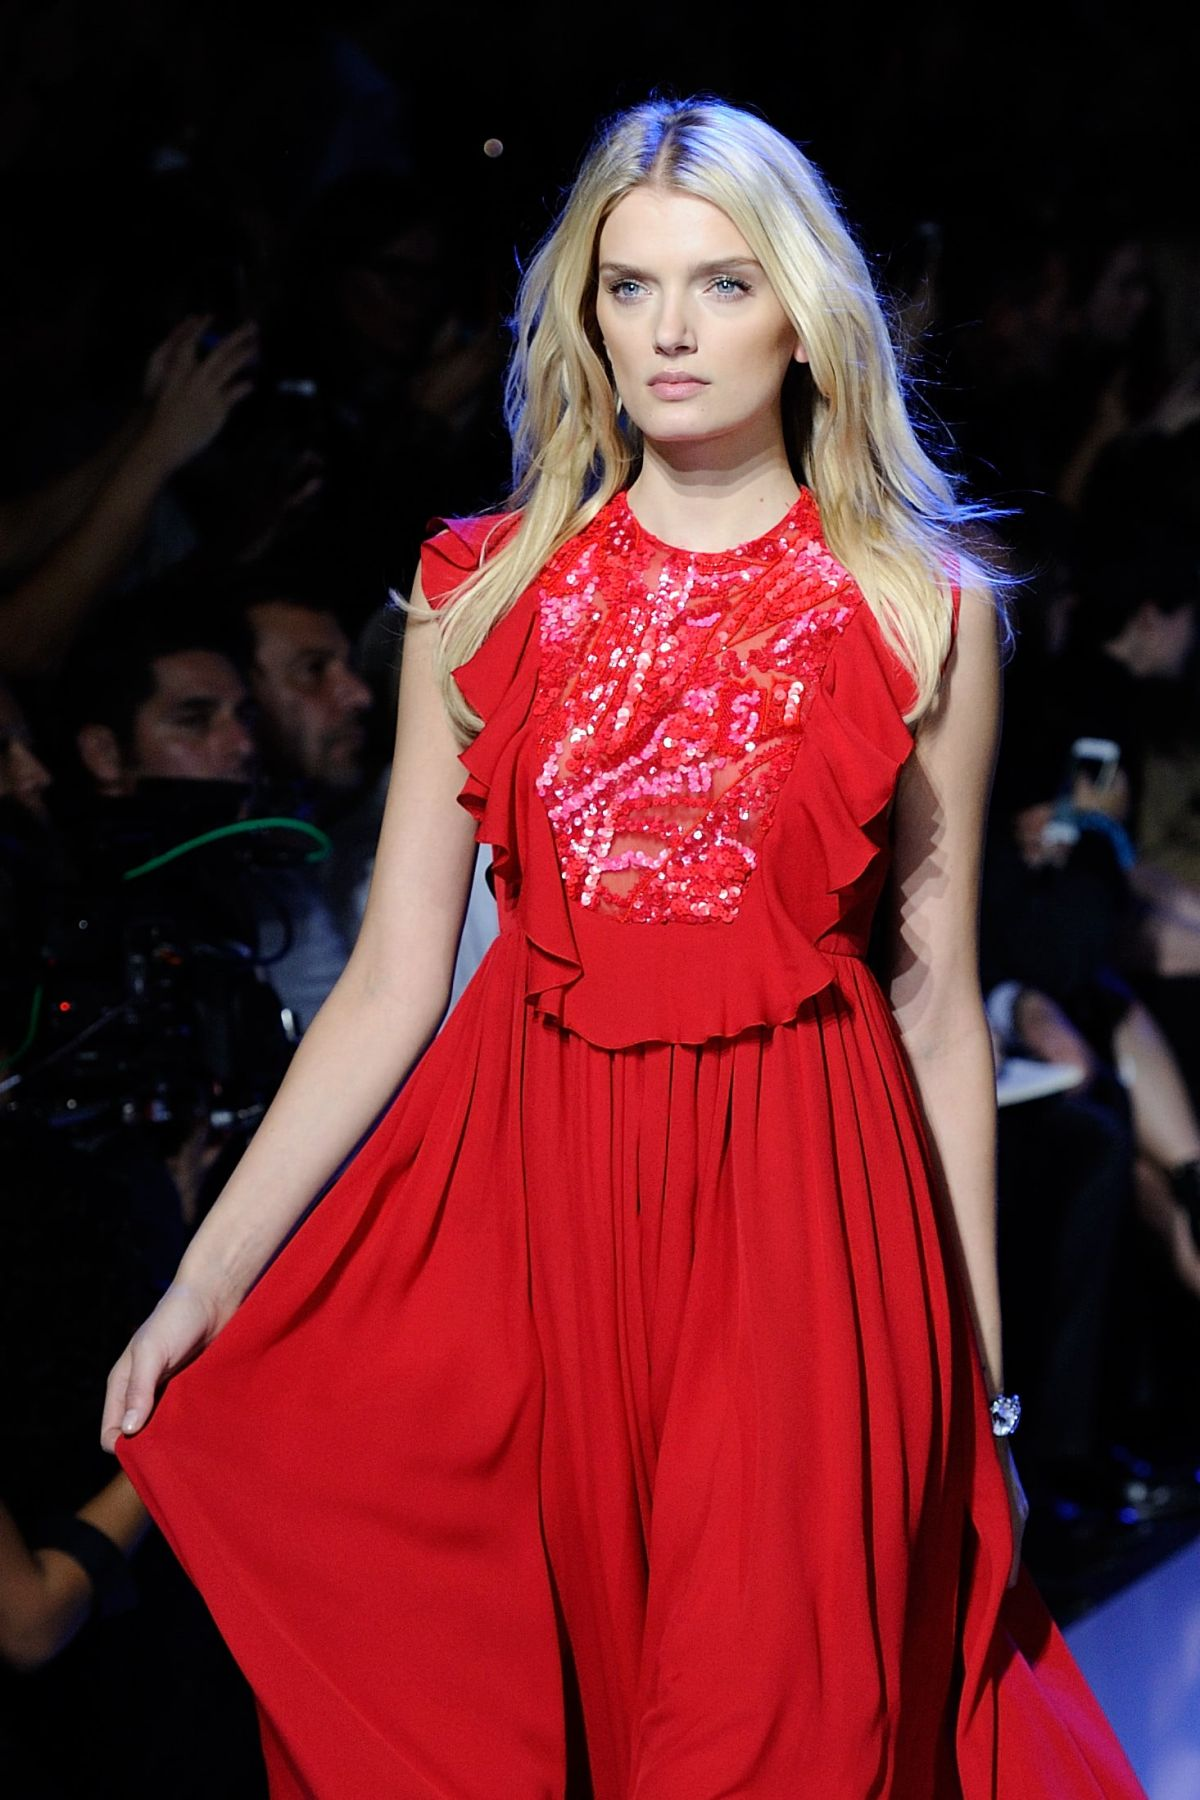 LILY DONALDSON at Elie Saab Fashion Show at Paris Fashion Week 10/03/2015